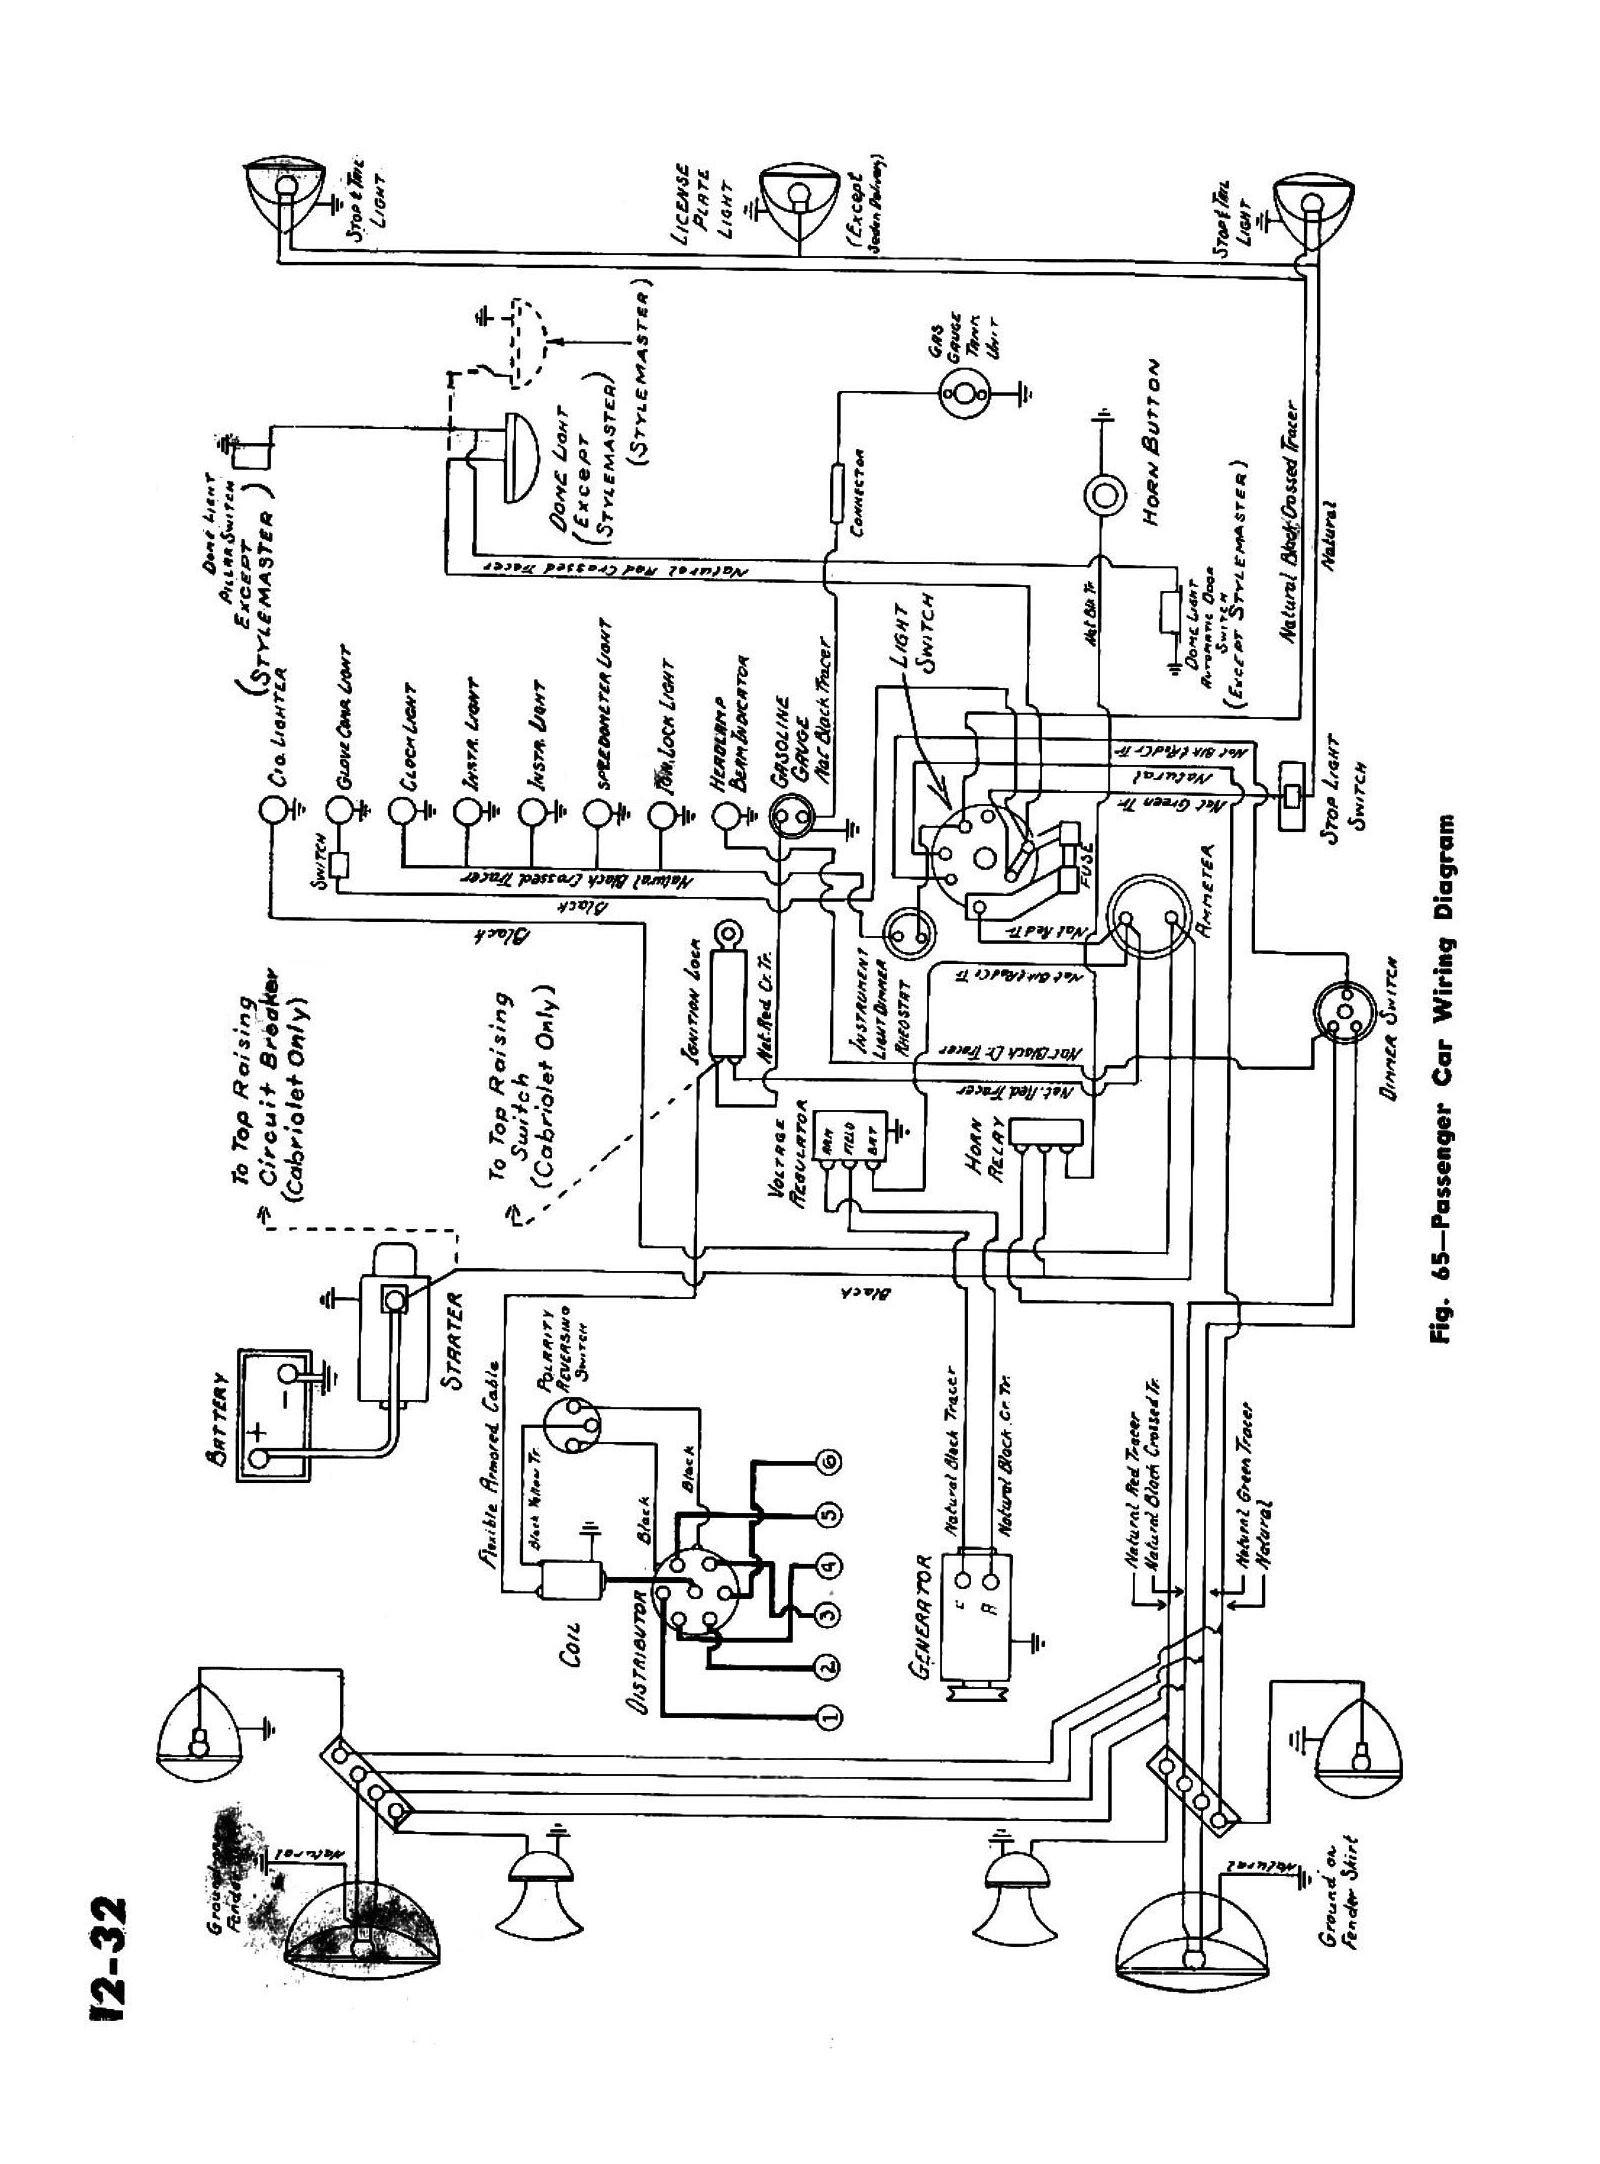 Basic Wiring Diagram For Car